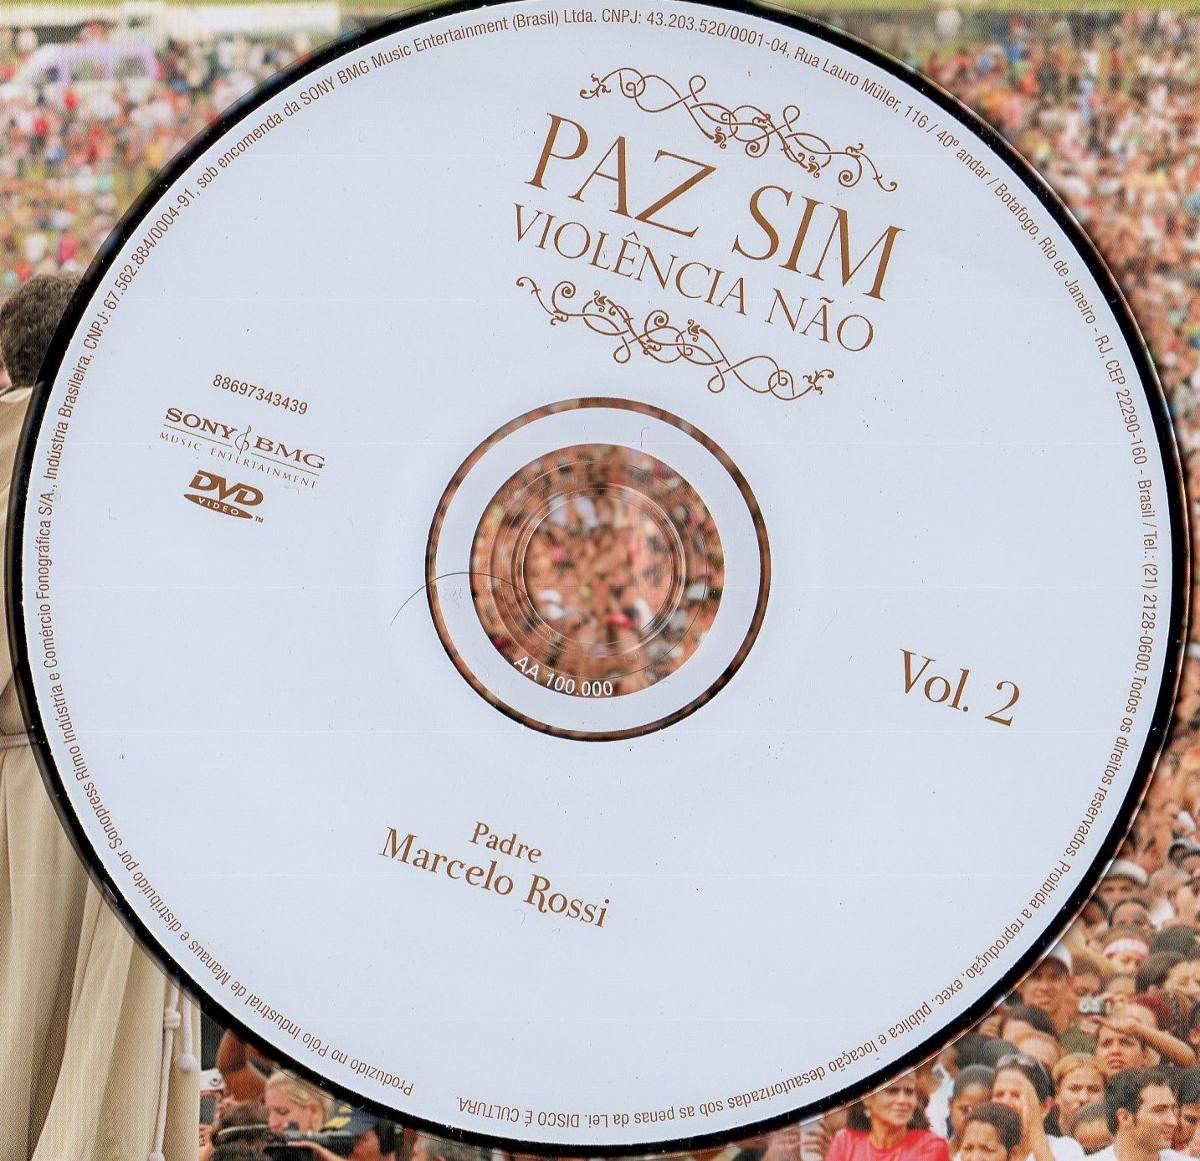 PAZ SIM 1 PADRE CD NO BAIXAR MARCELO VIOLENCIA ROSSI